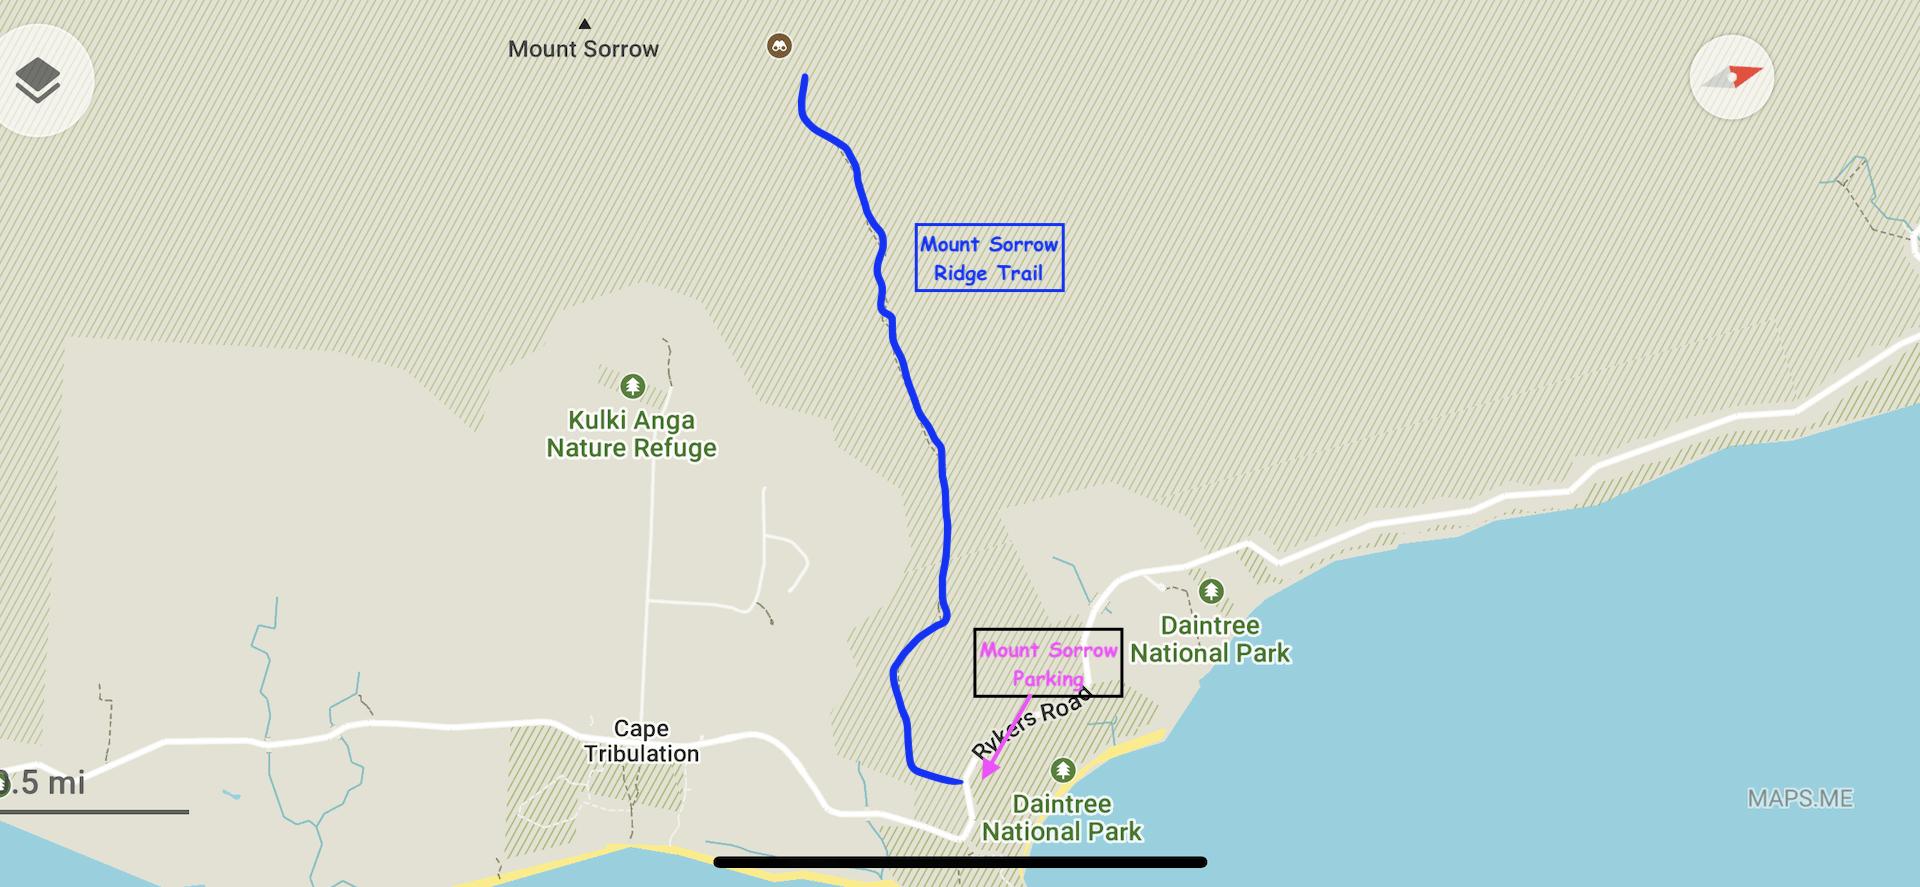 Mounnt Sorrow Map